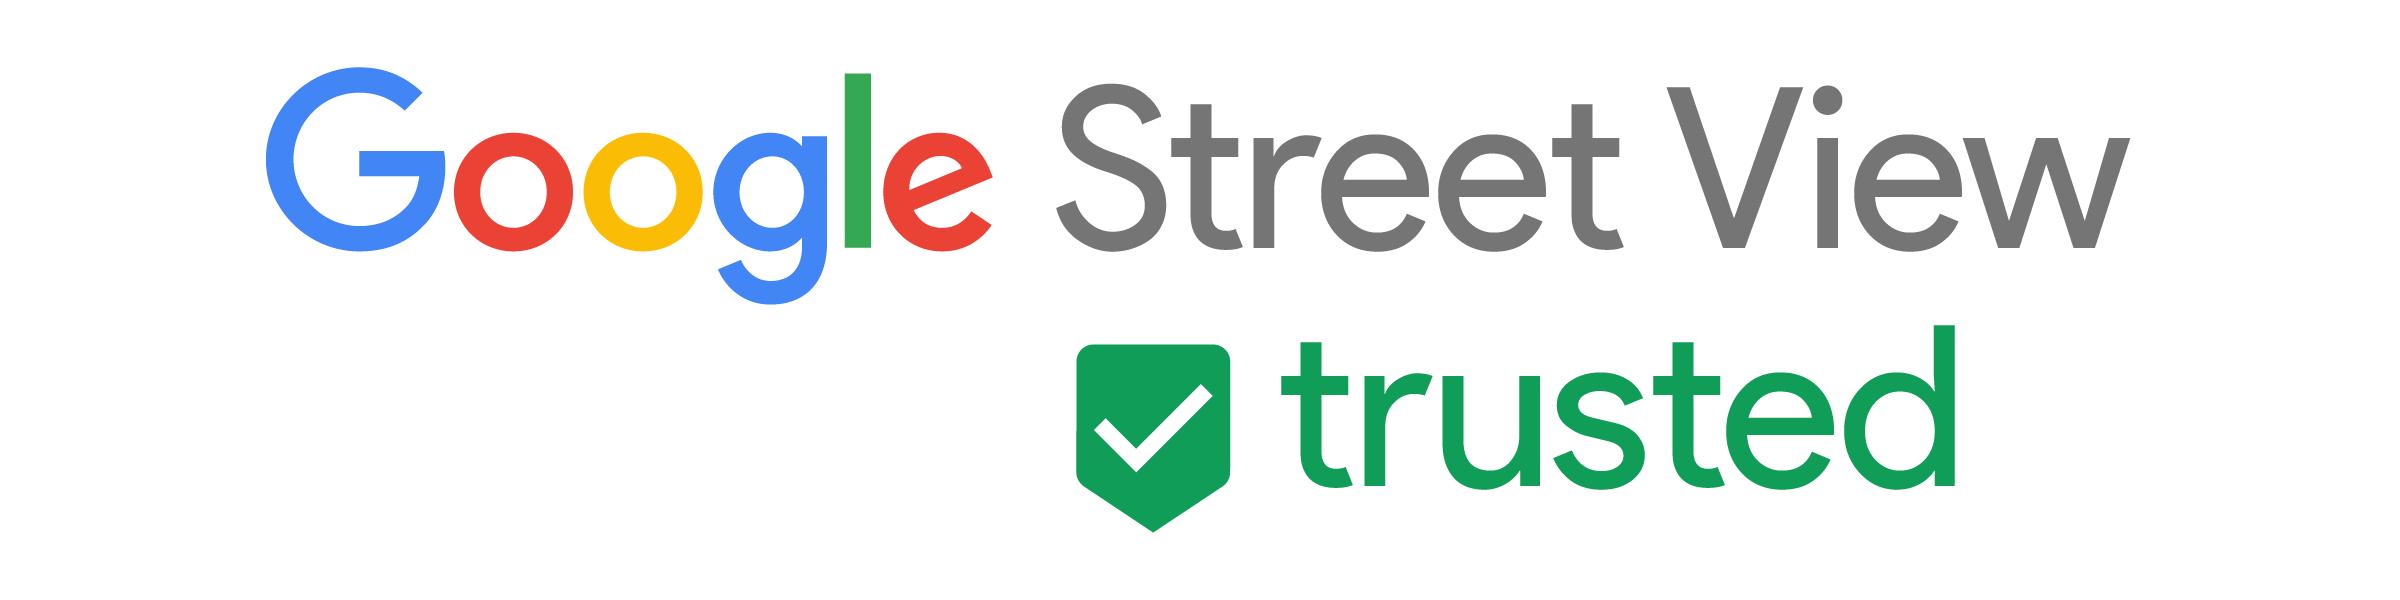 Google Streetview vertrouwde fotograaf